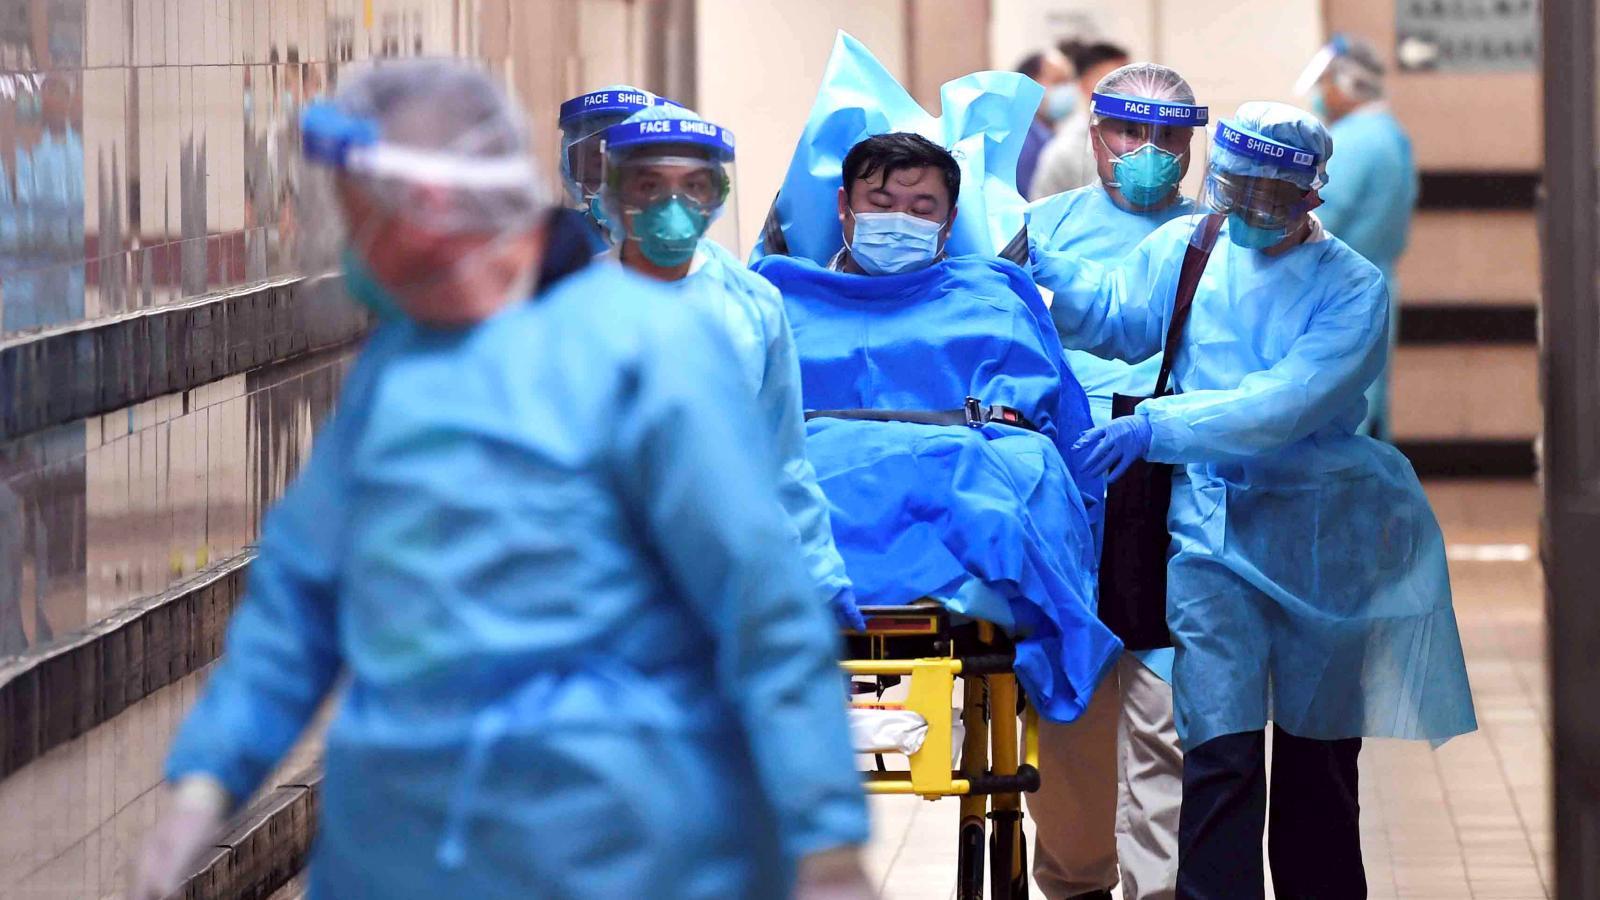 Sarvodaya Hospital Delhi Partners with mfine to Manage Coronavirus Outbreak